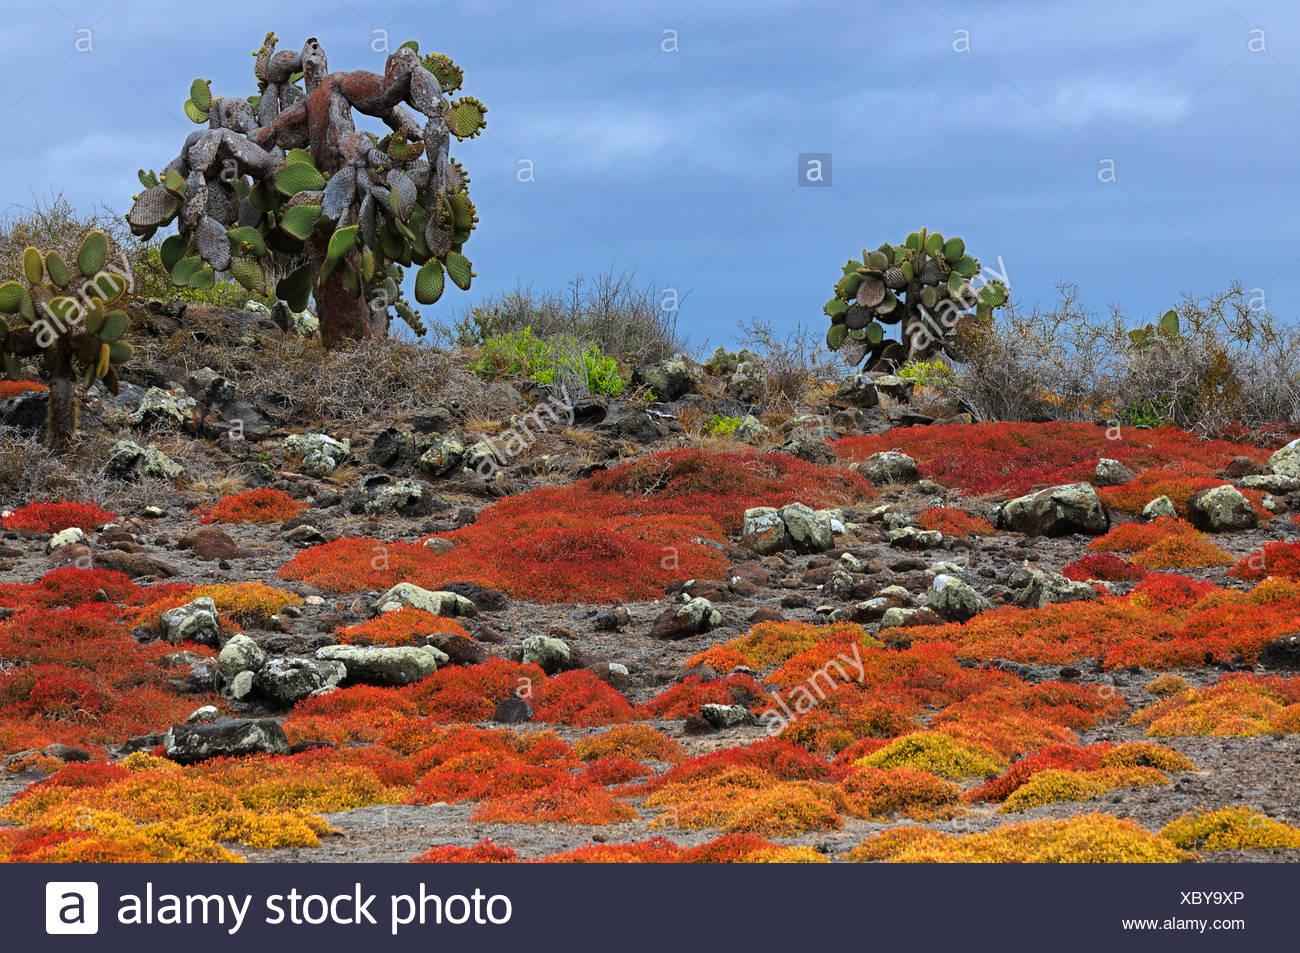 Opuntias (Opuntia echios) growing out of a carpet of Galapagos sesuvium, Plaza Sur Island, Galapagos Islands, Ecuador, South Am - Stock Image